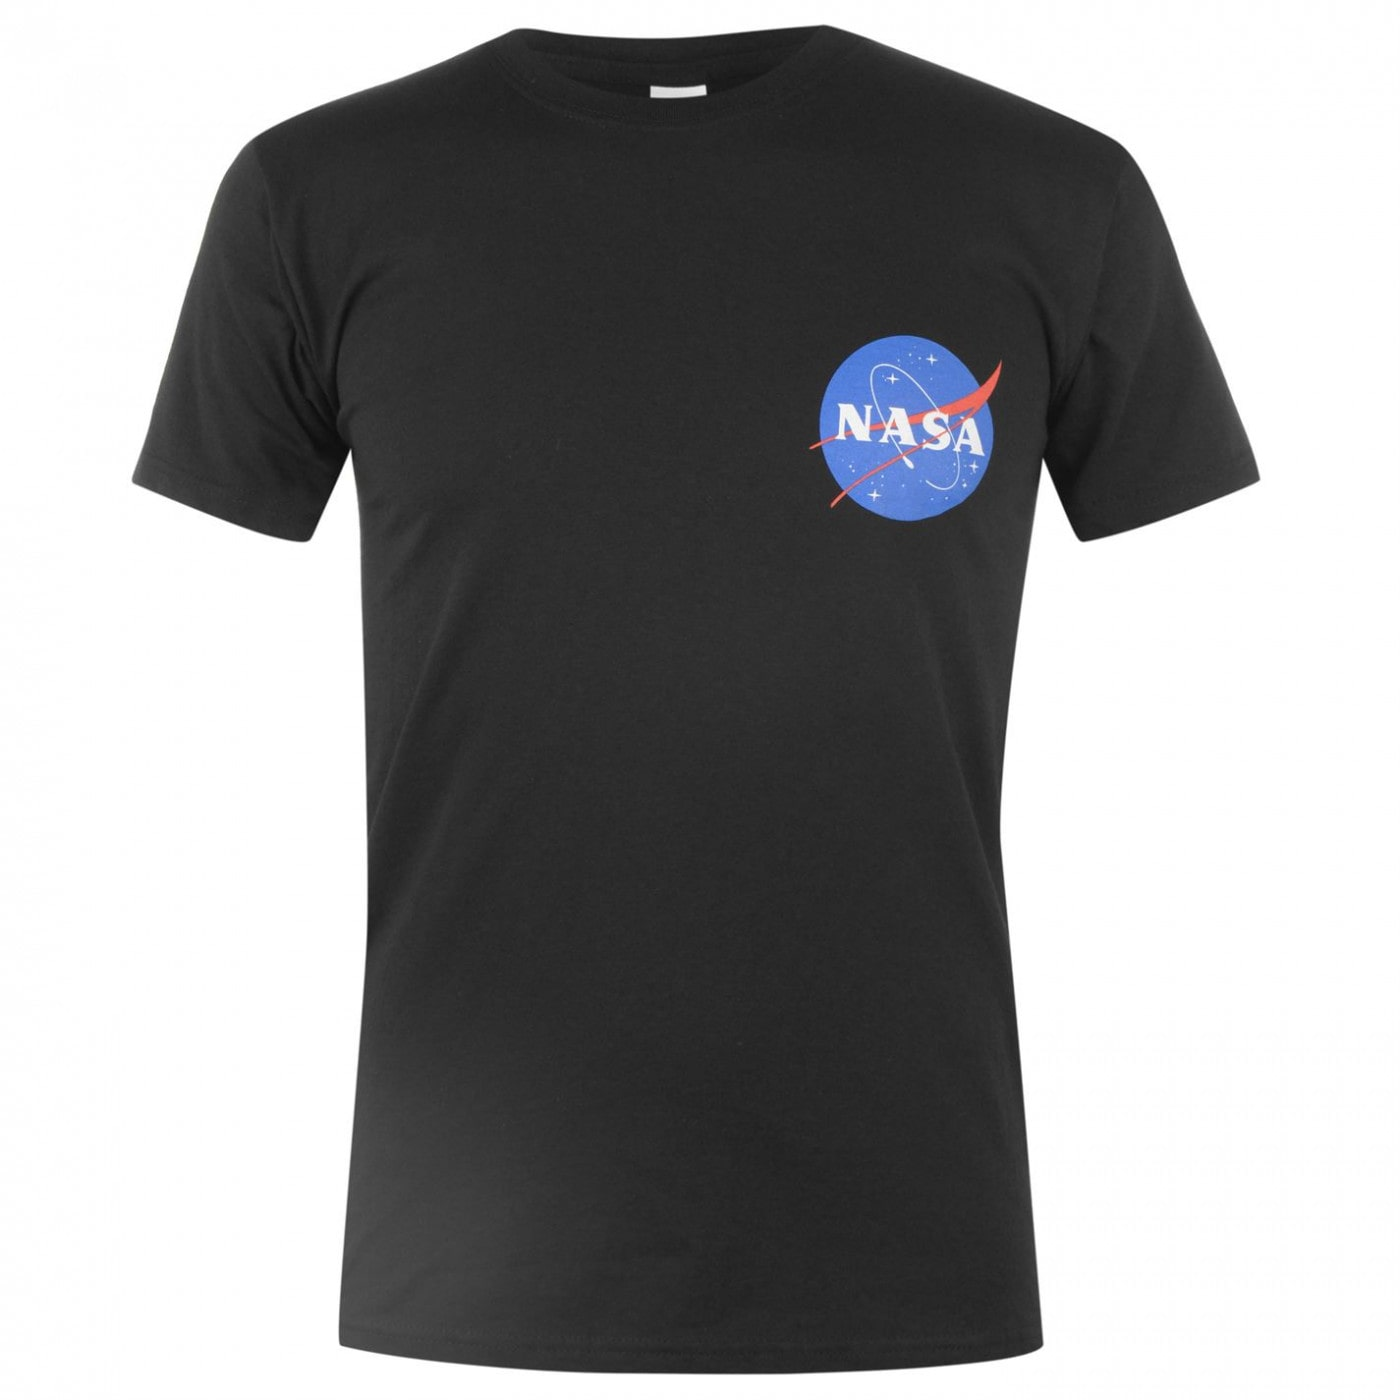 official nasa merchandise - 720×720